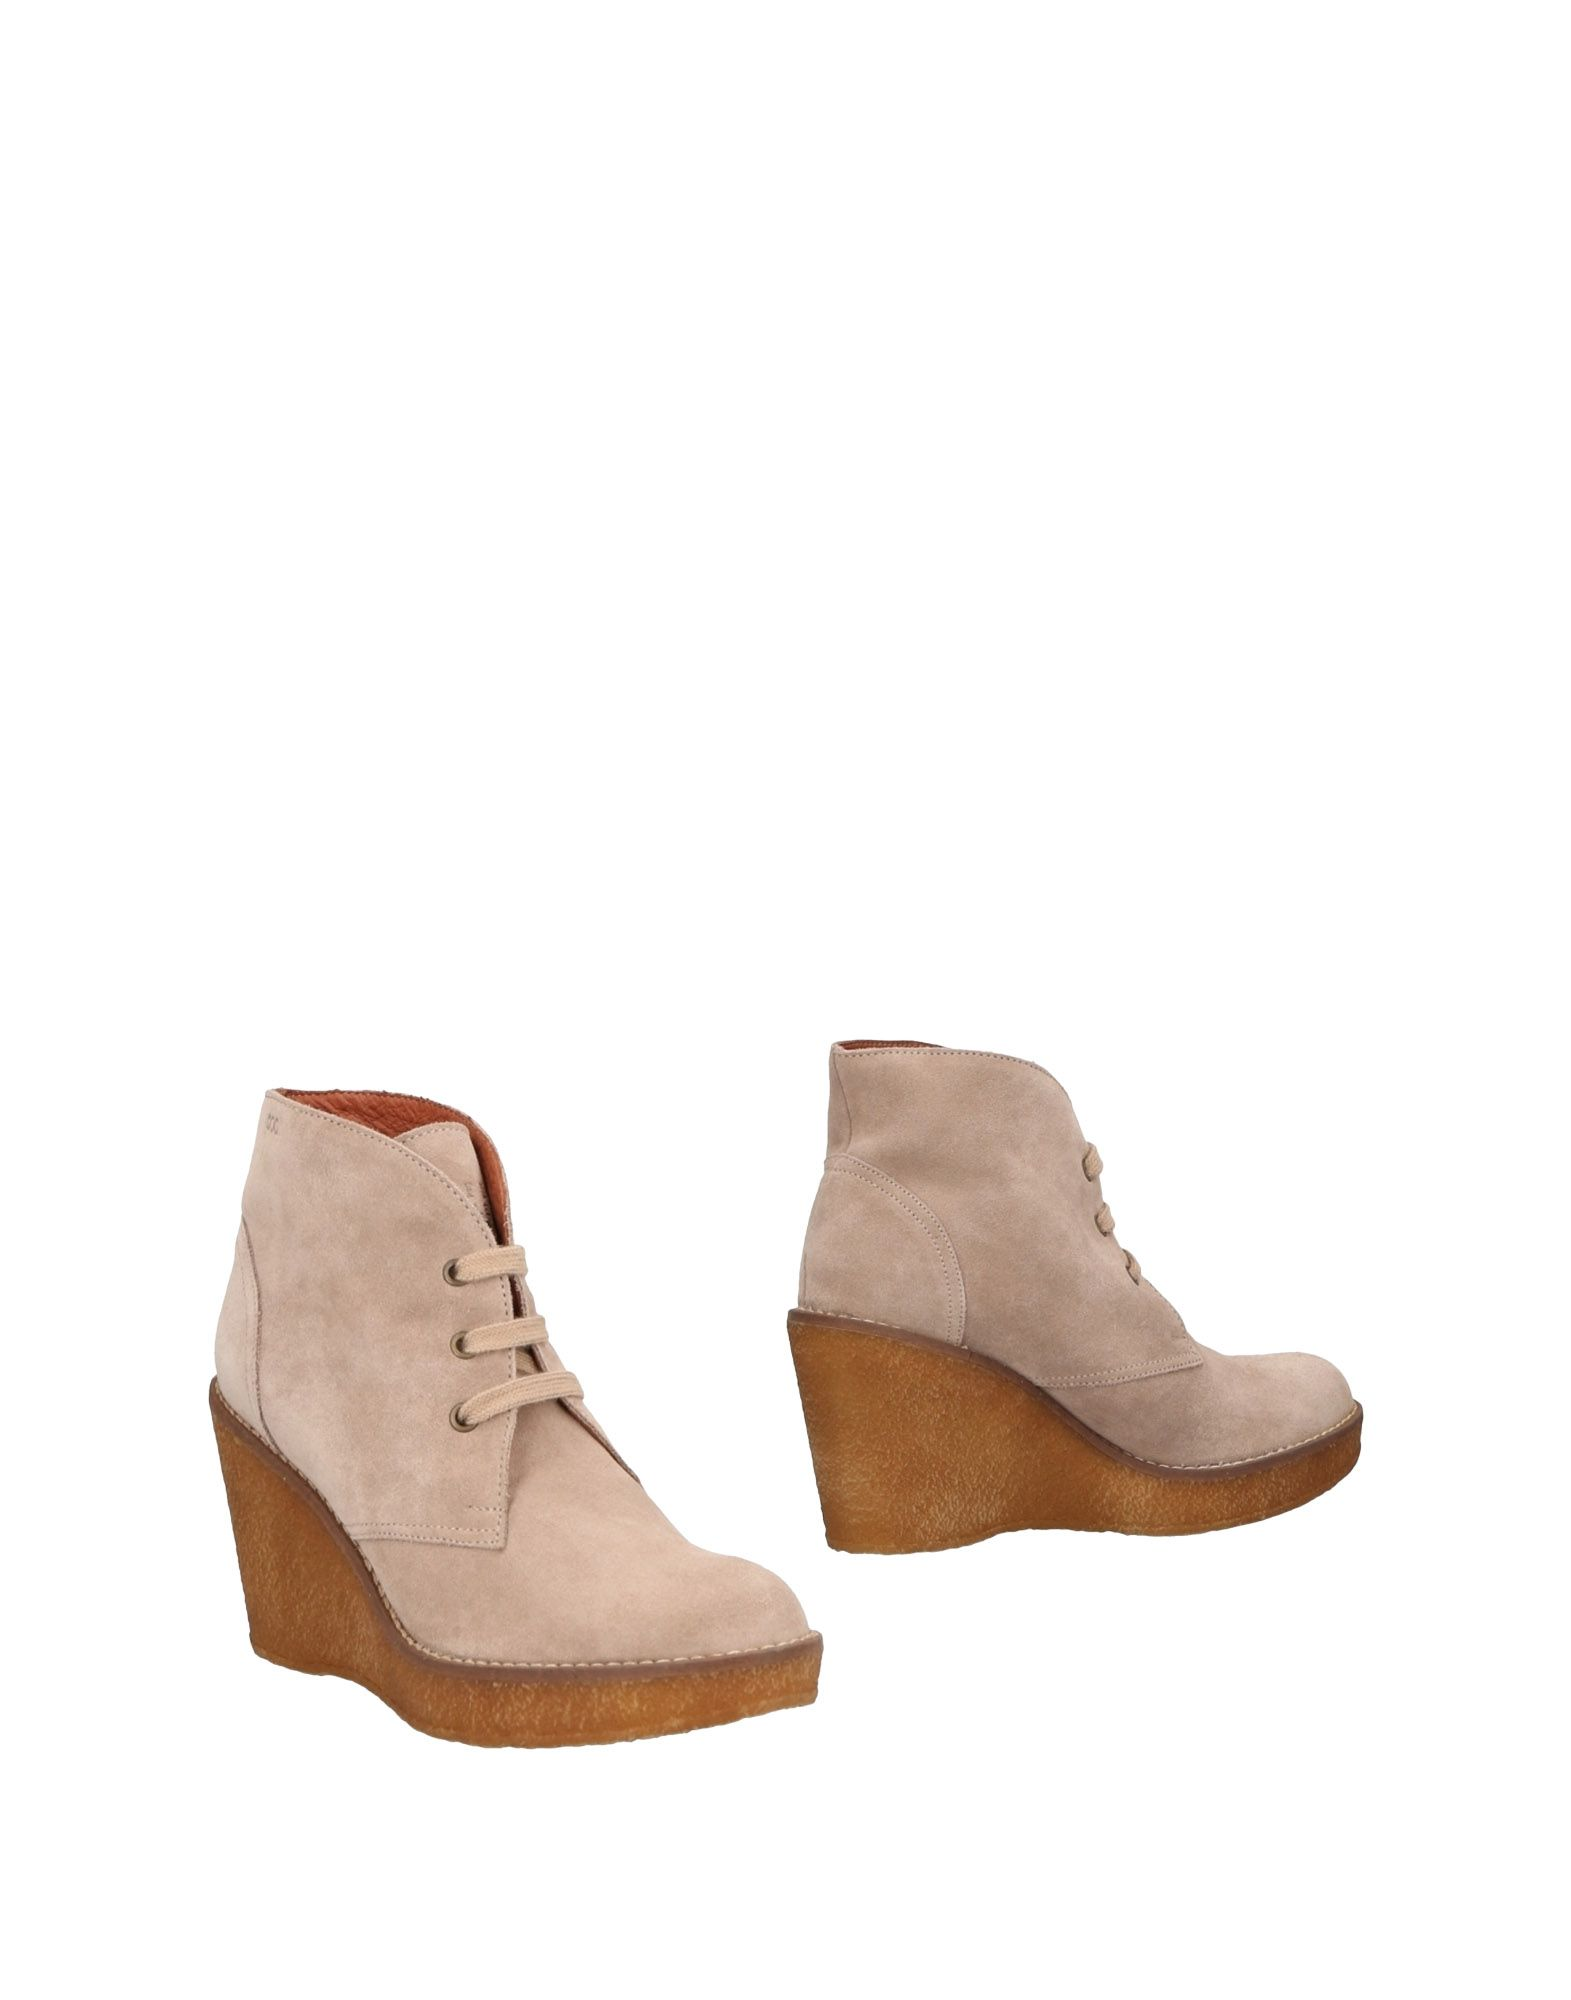 Stilvolle billige Schuhe Serafini 11471864GX Etoile Stiefelette Damen  11471864GX Serafini c9943d